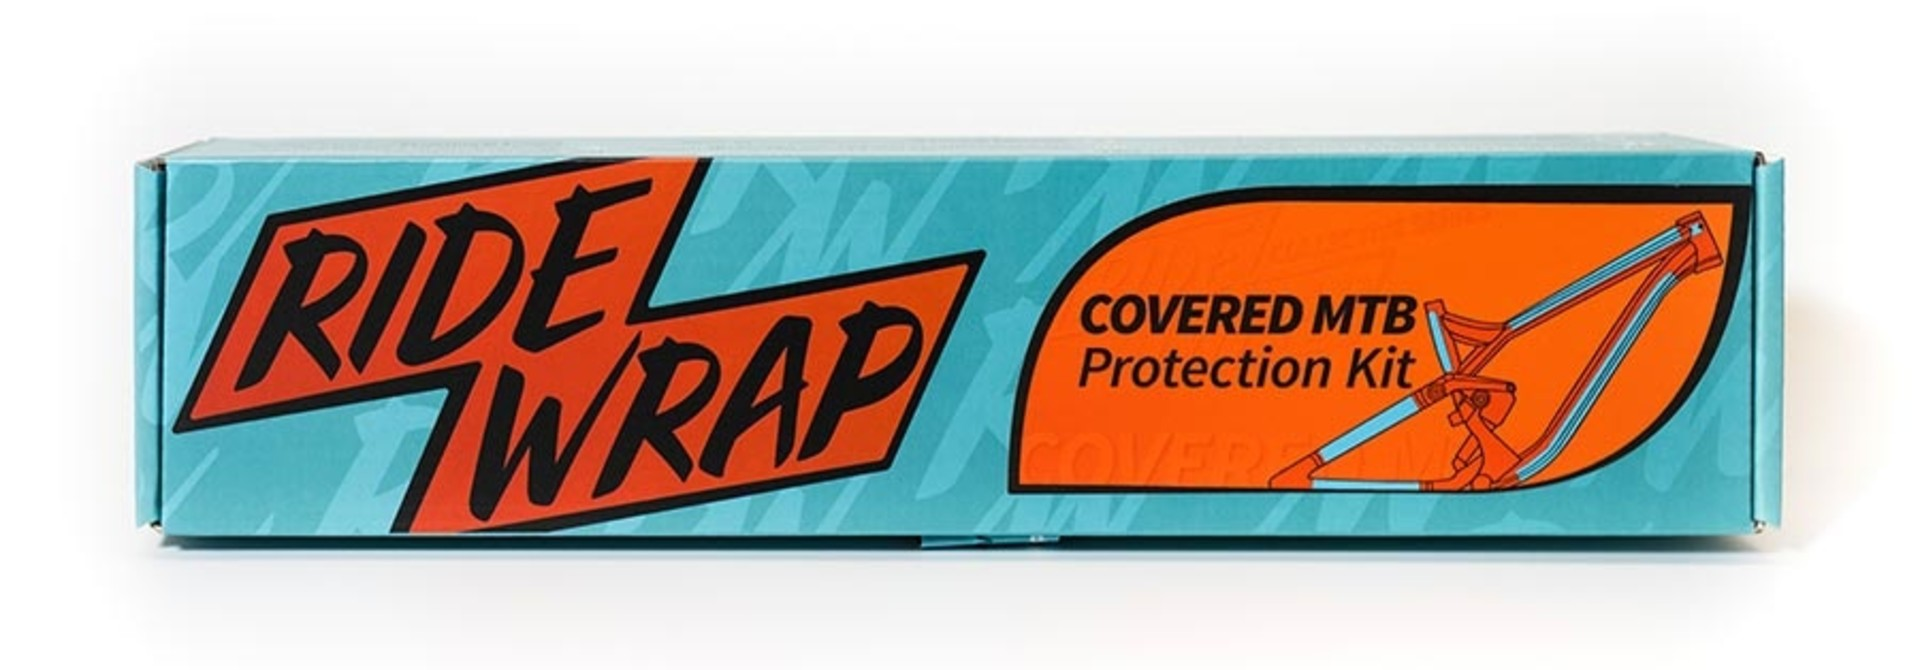 RideWrap Covered MTB - Protective Wrap Kit